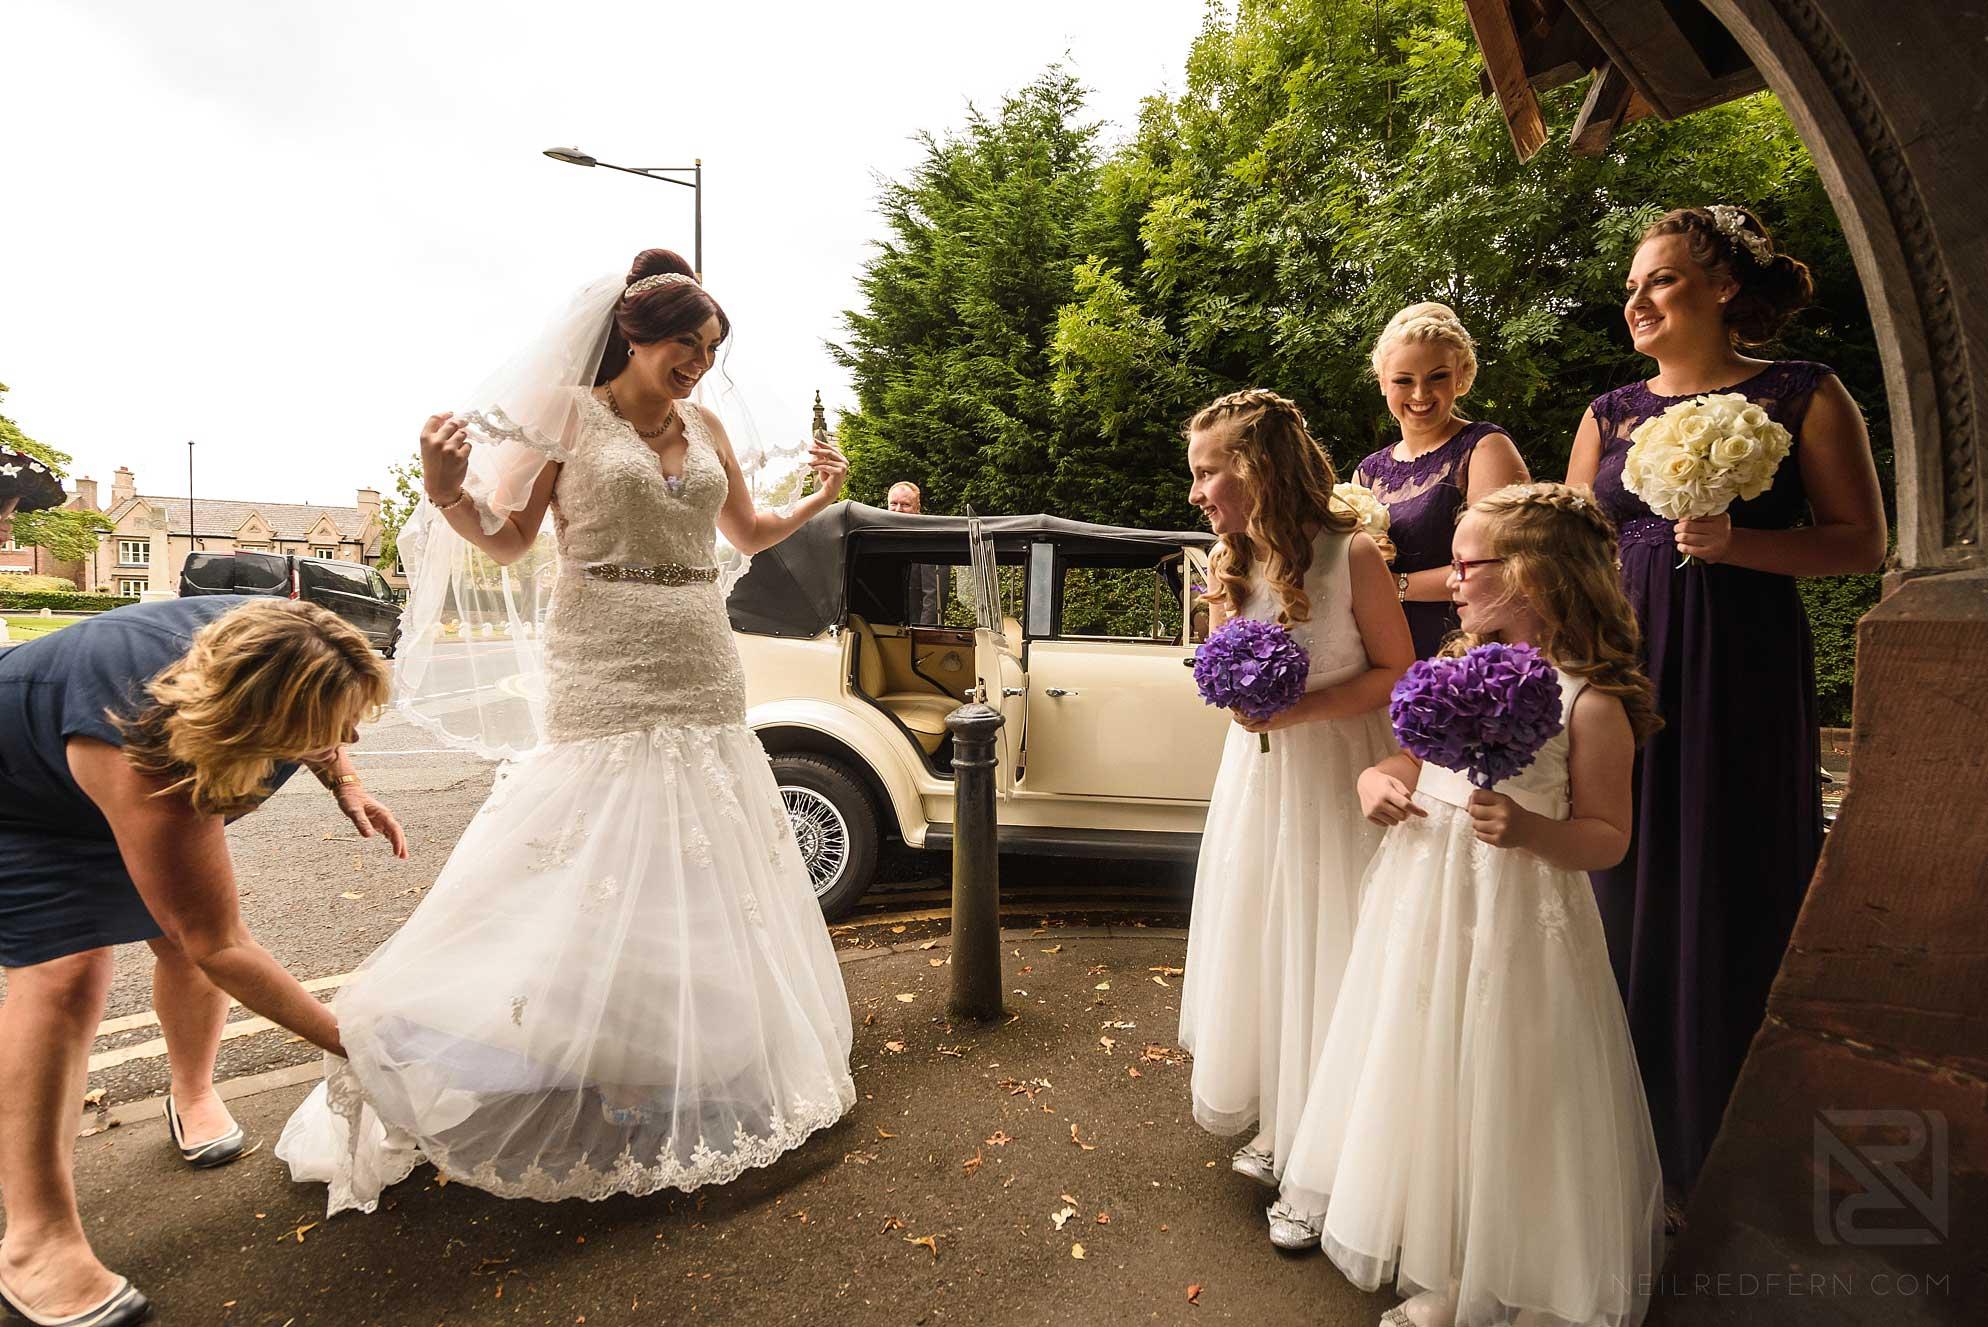 bride and bridesmaids by car